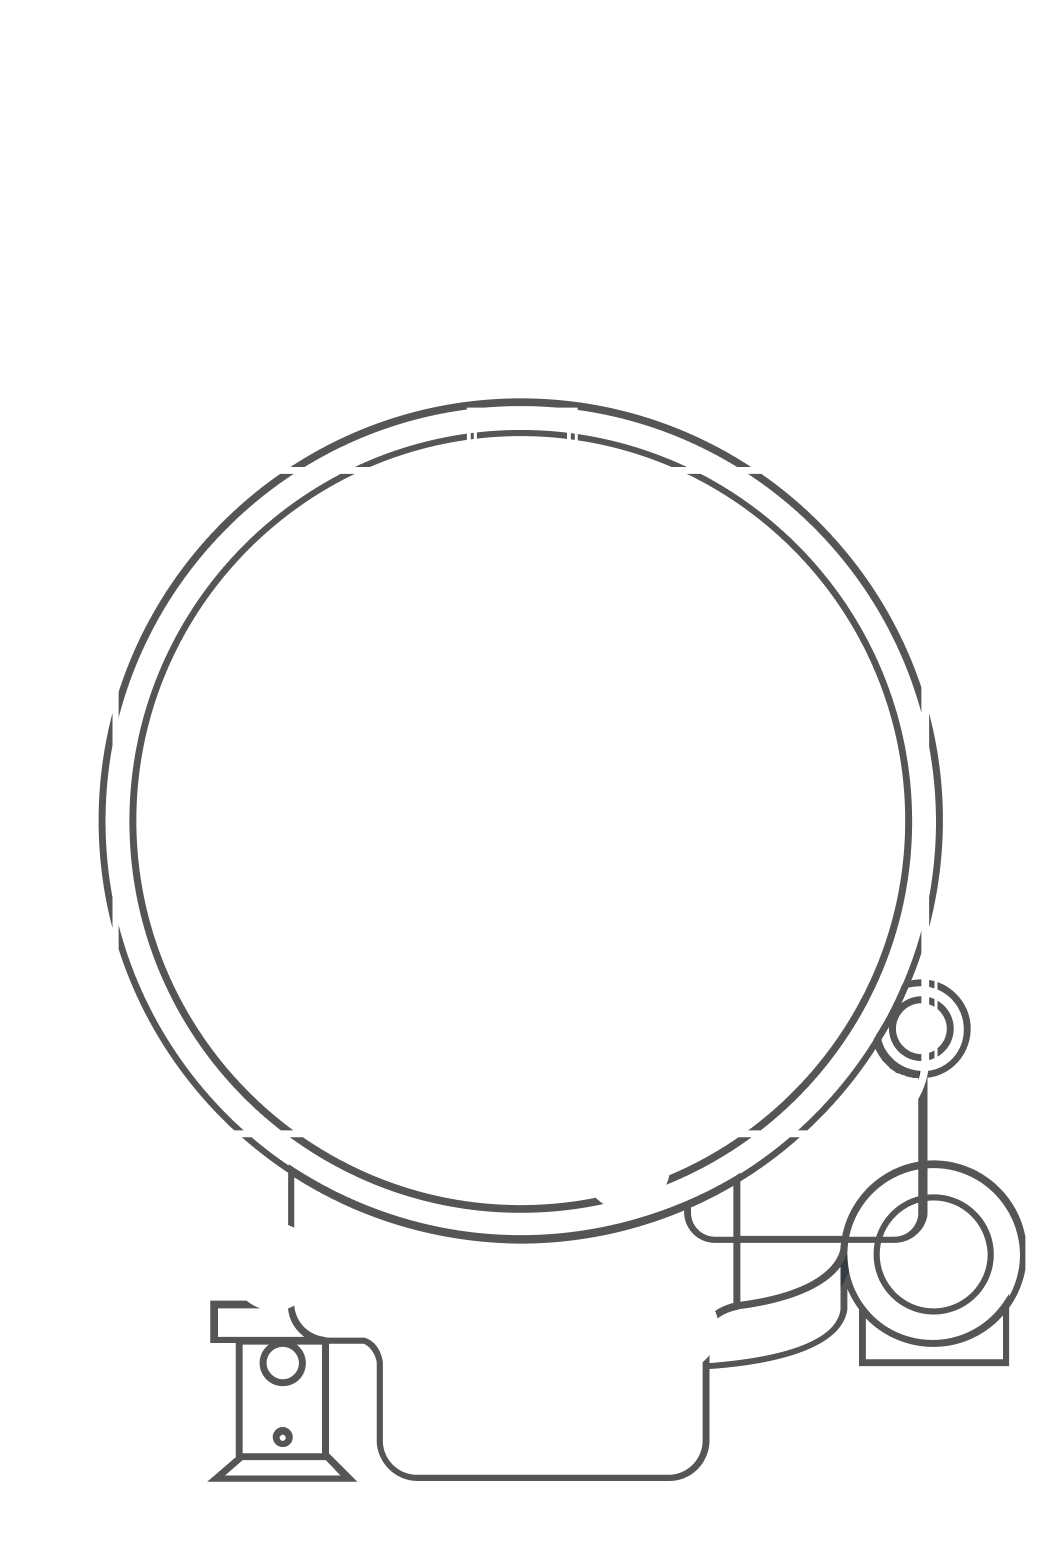 Open oven racks